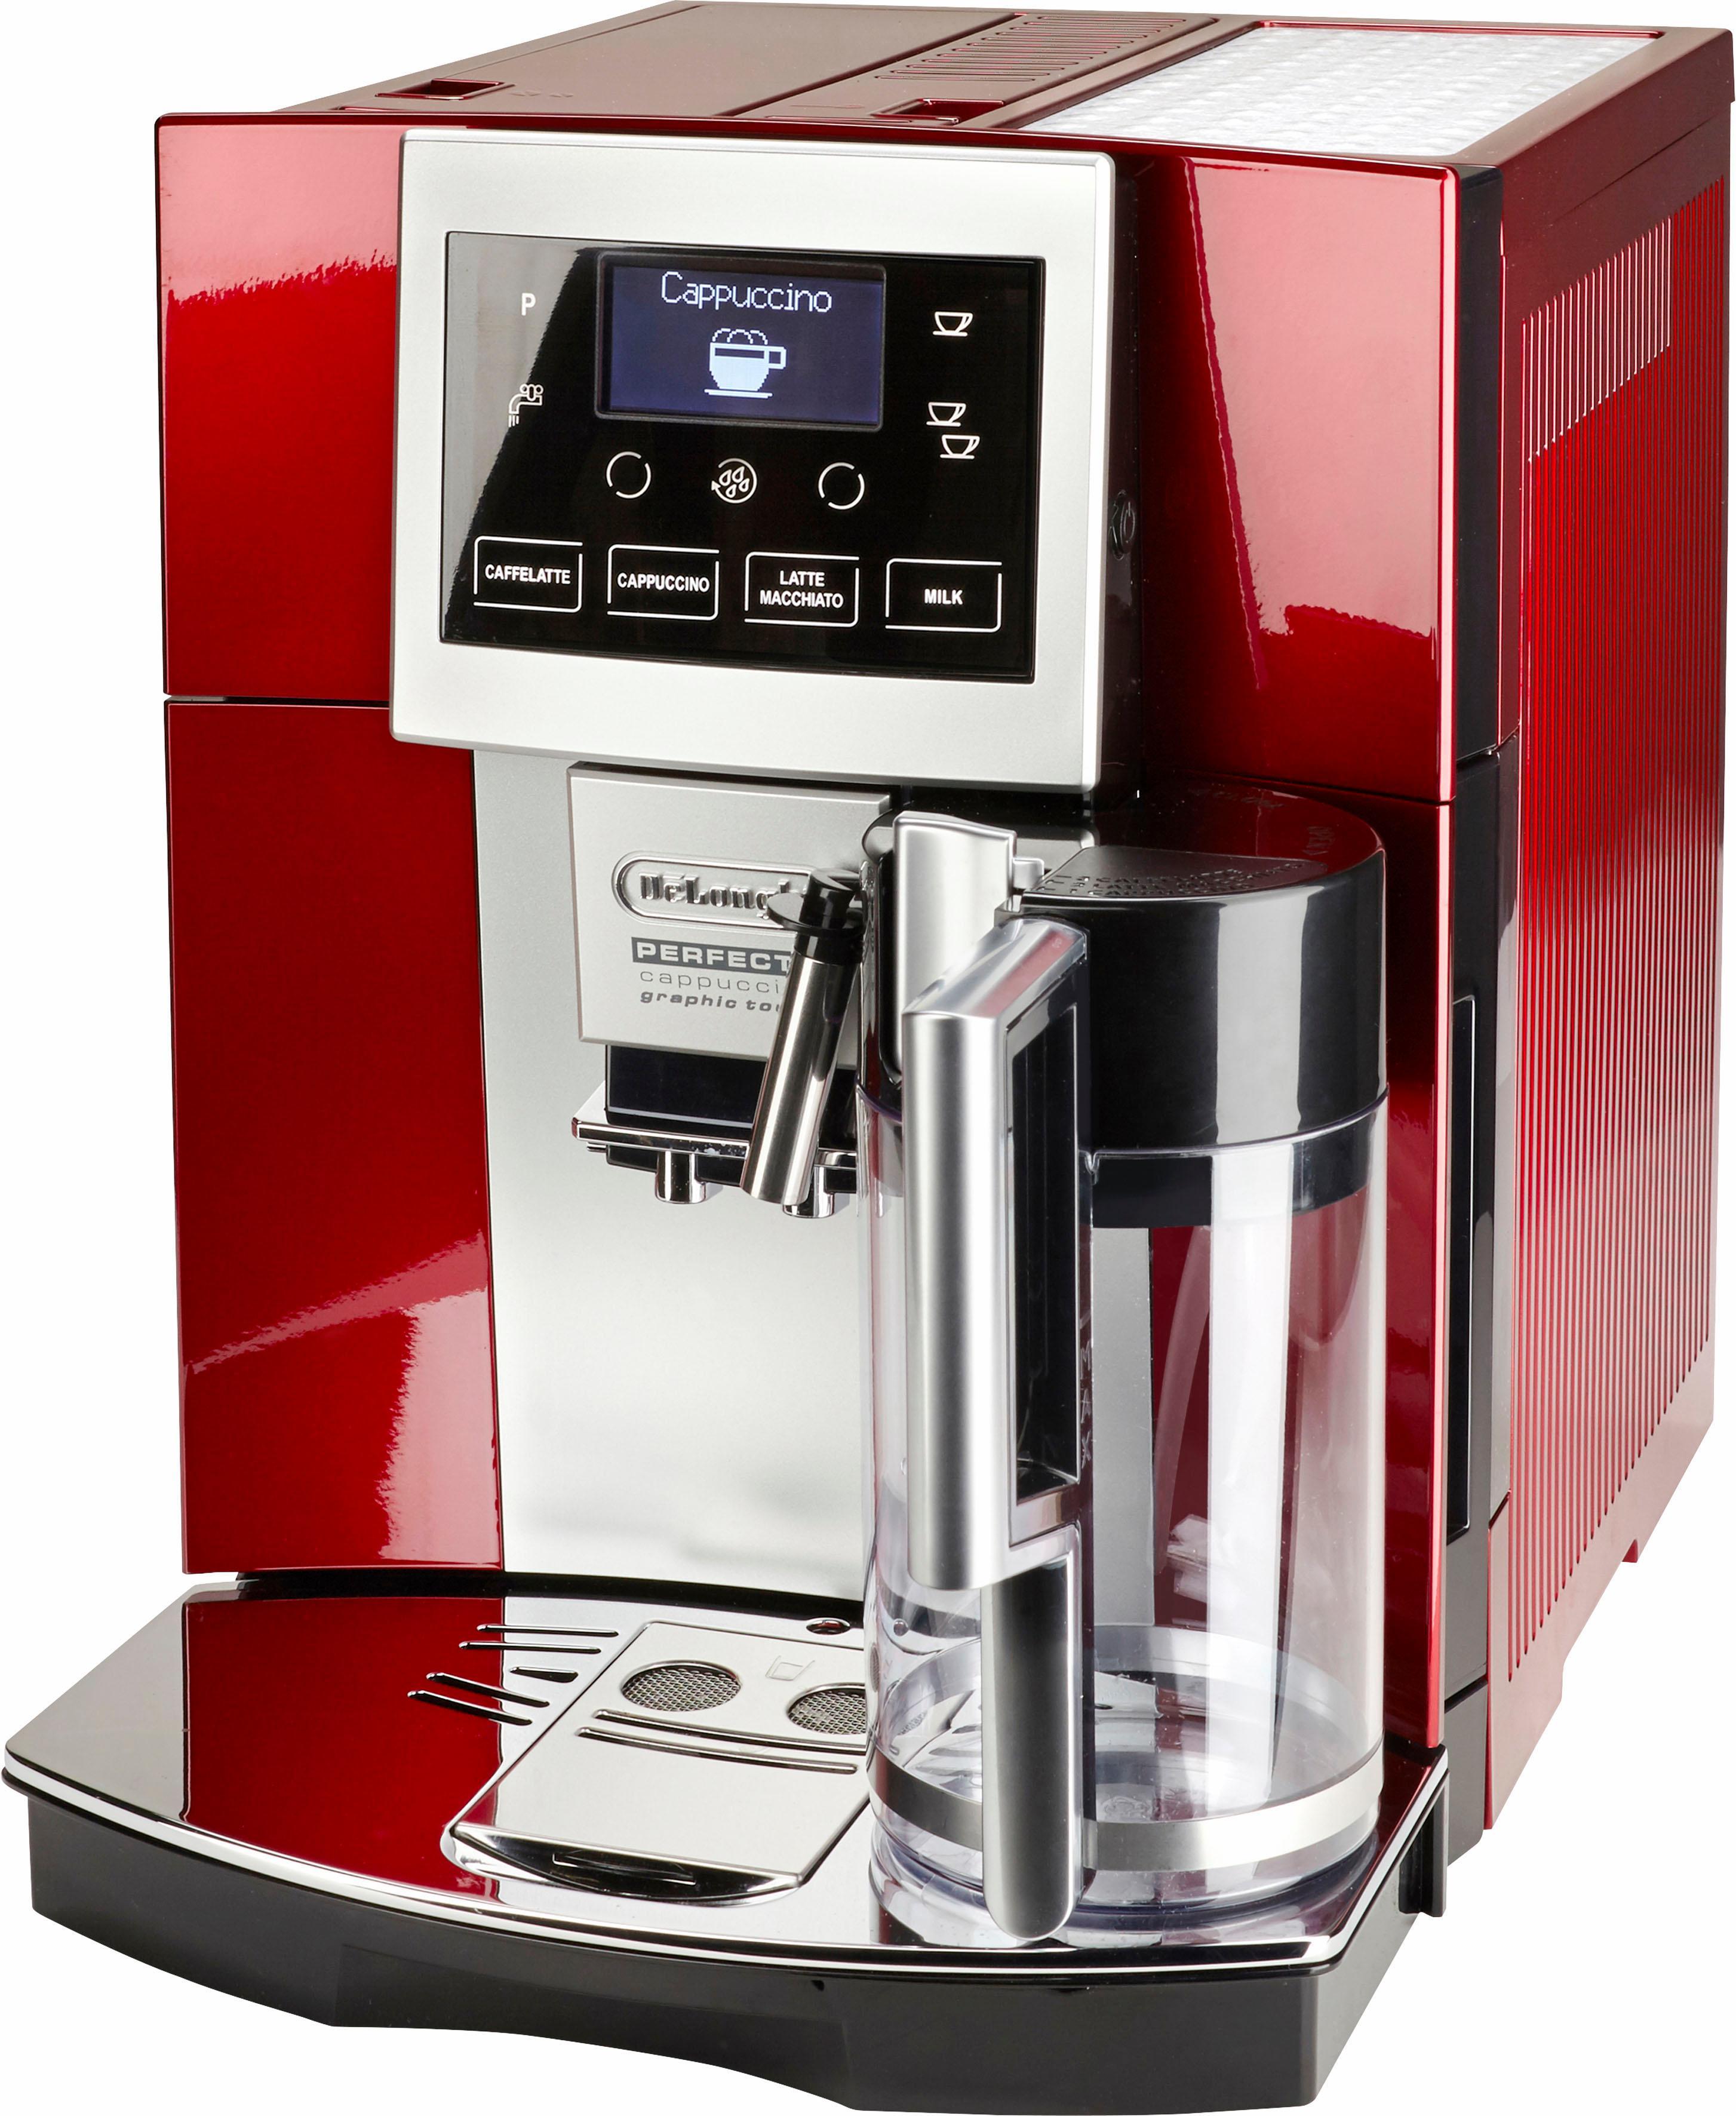 De´Longhi Kaffeevollautomat ESAM 5708.R, 1,7l Tank, Kegelmahlwerk | Küche und Esszimmer > Kaffee und Tee > Kaffeevollautomaten | Rot | DELONGHI